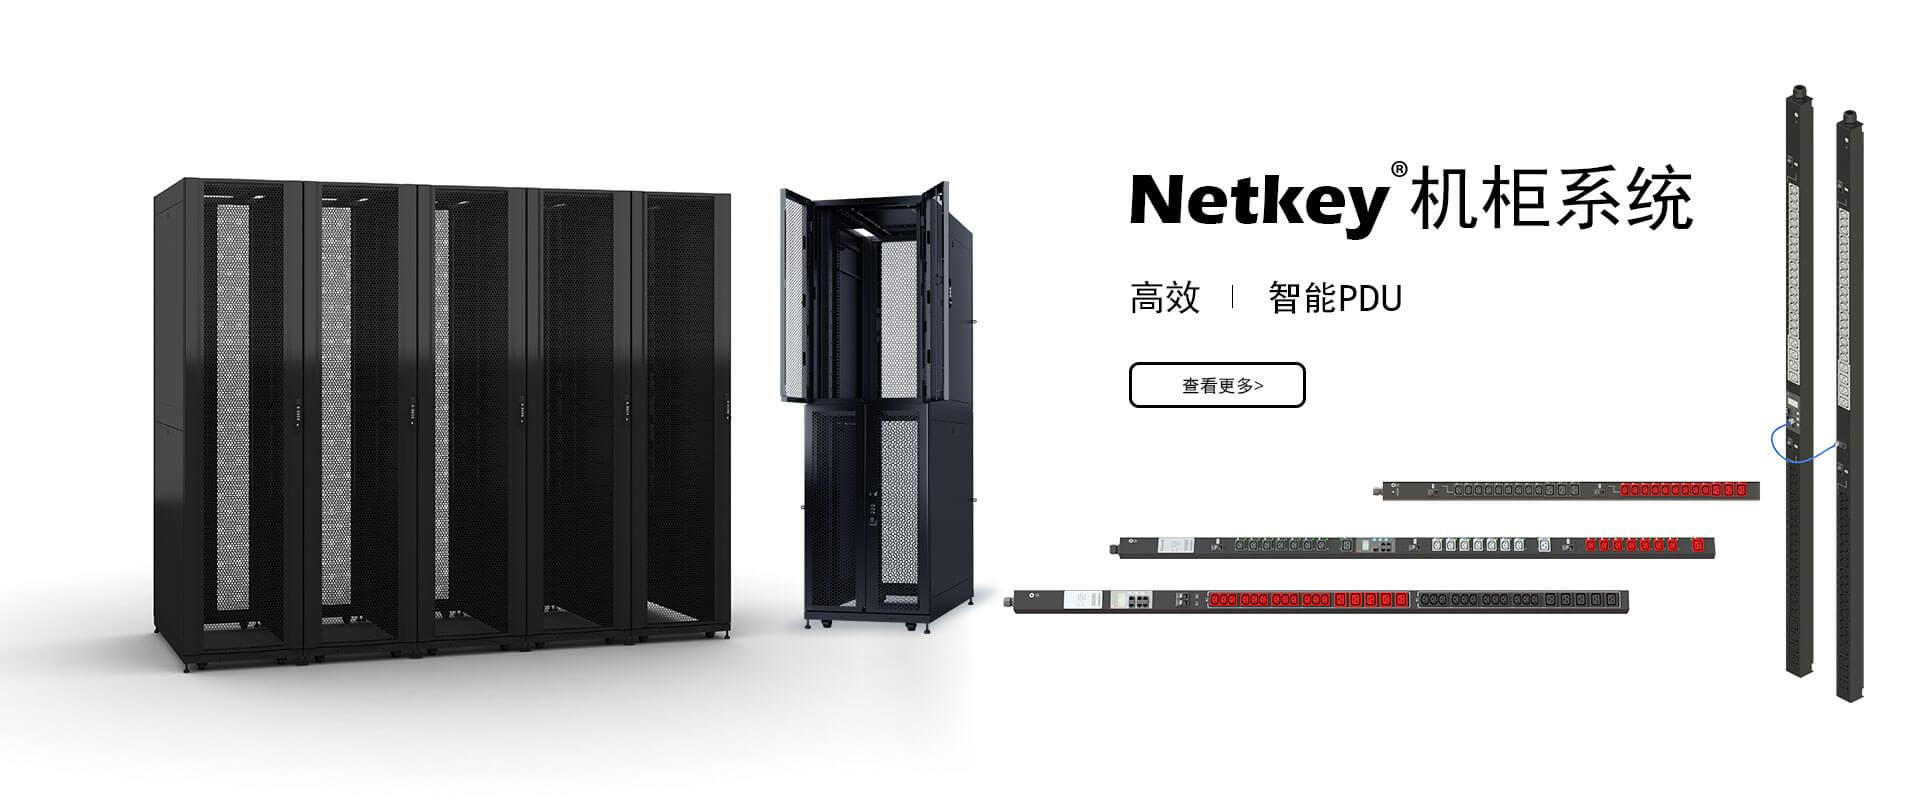 Netkey 机柜系统